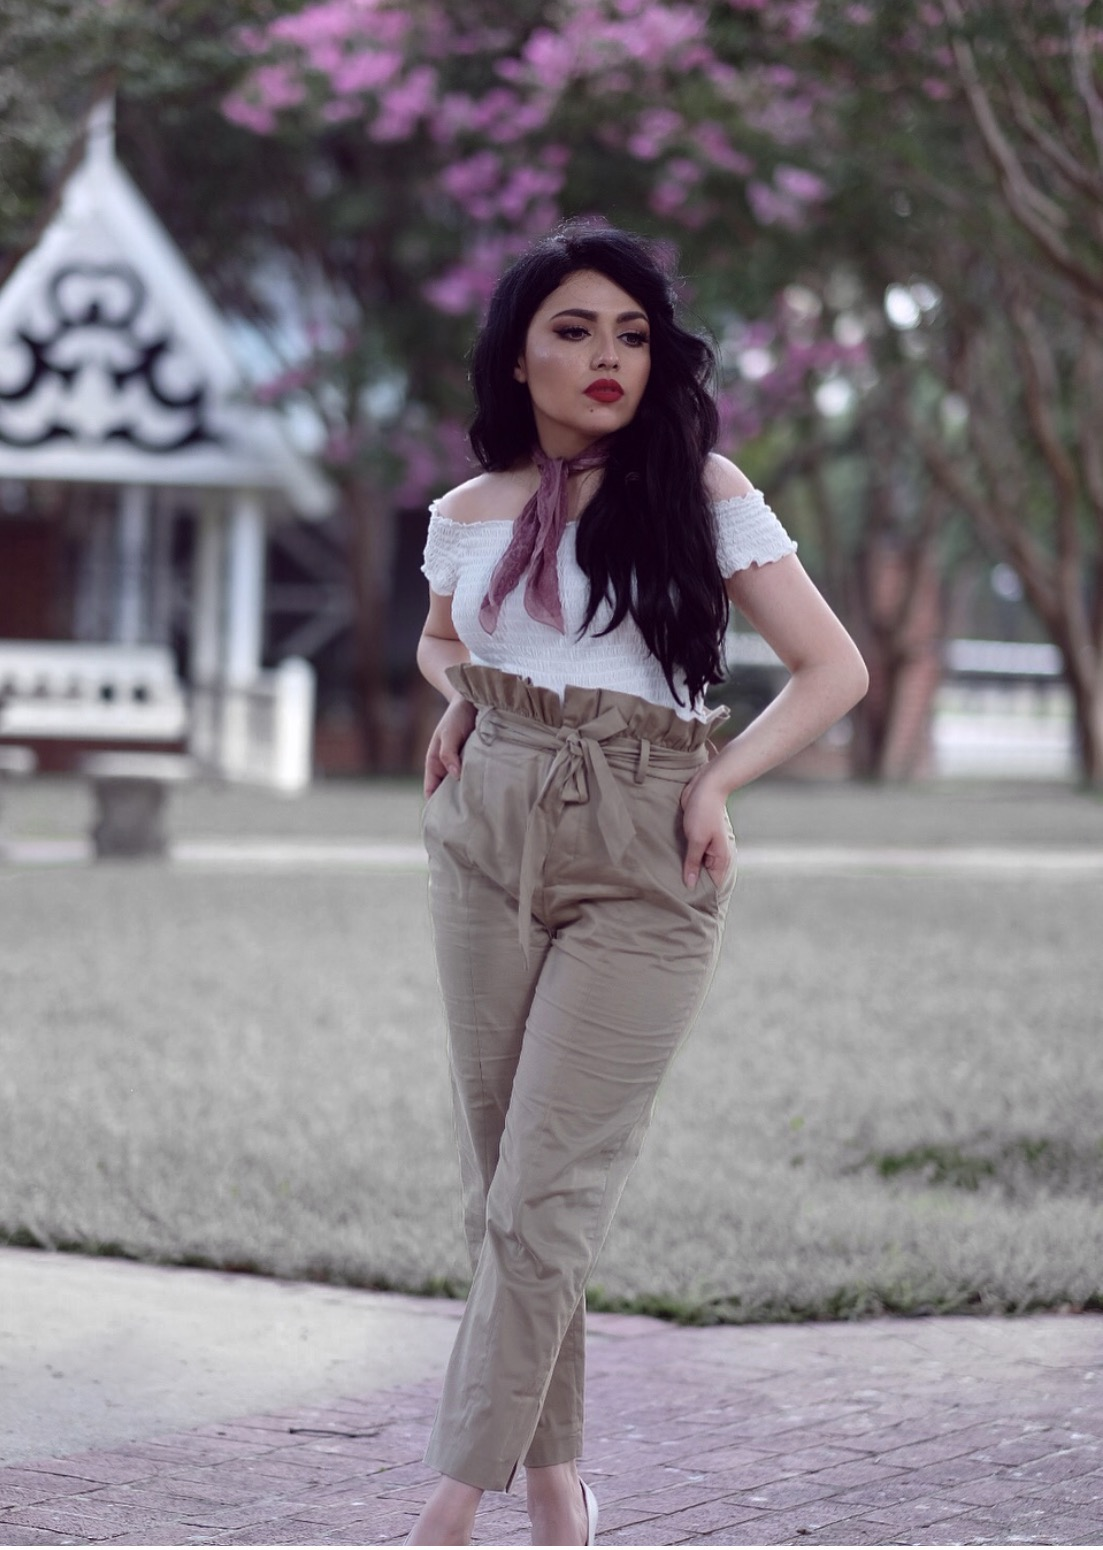 Ashley davenport fashion blog 83